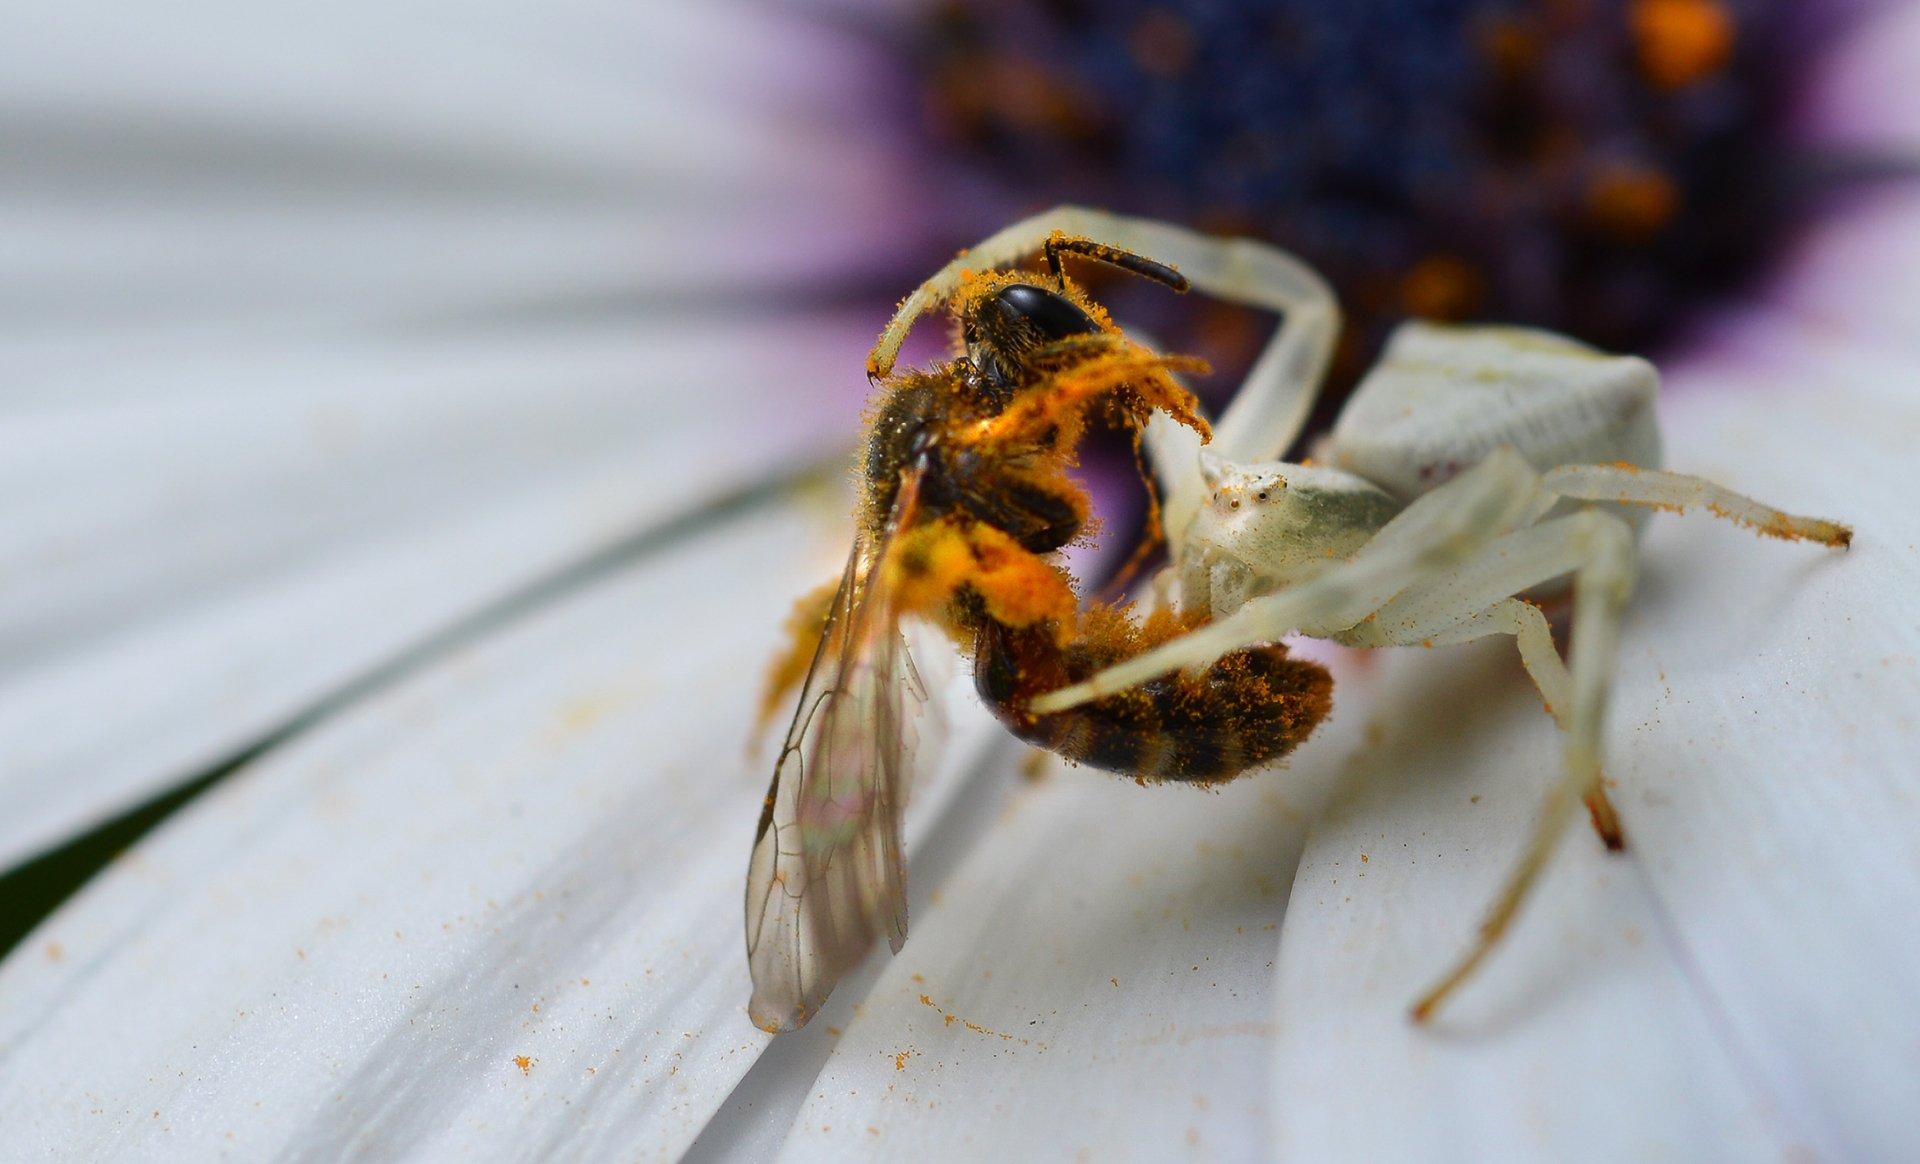 природа, макро, хищник и жертва, паук, мизумена, пчела, Неля Рачкова